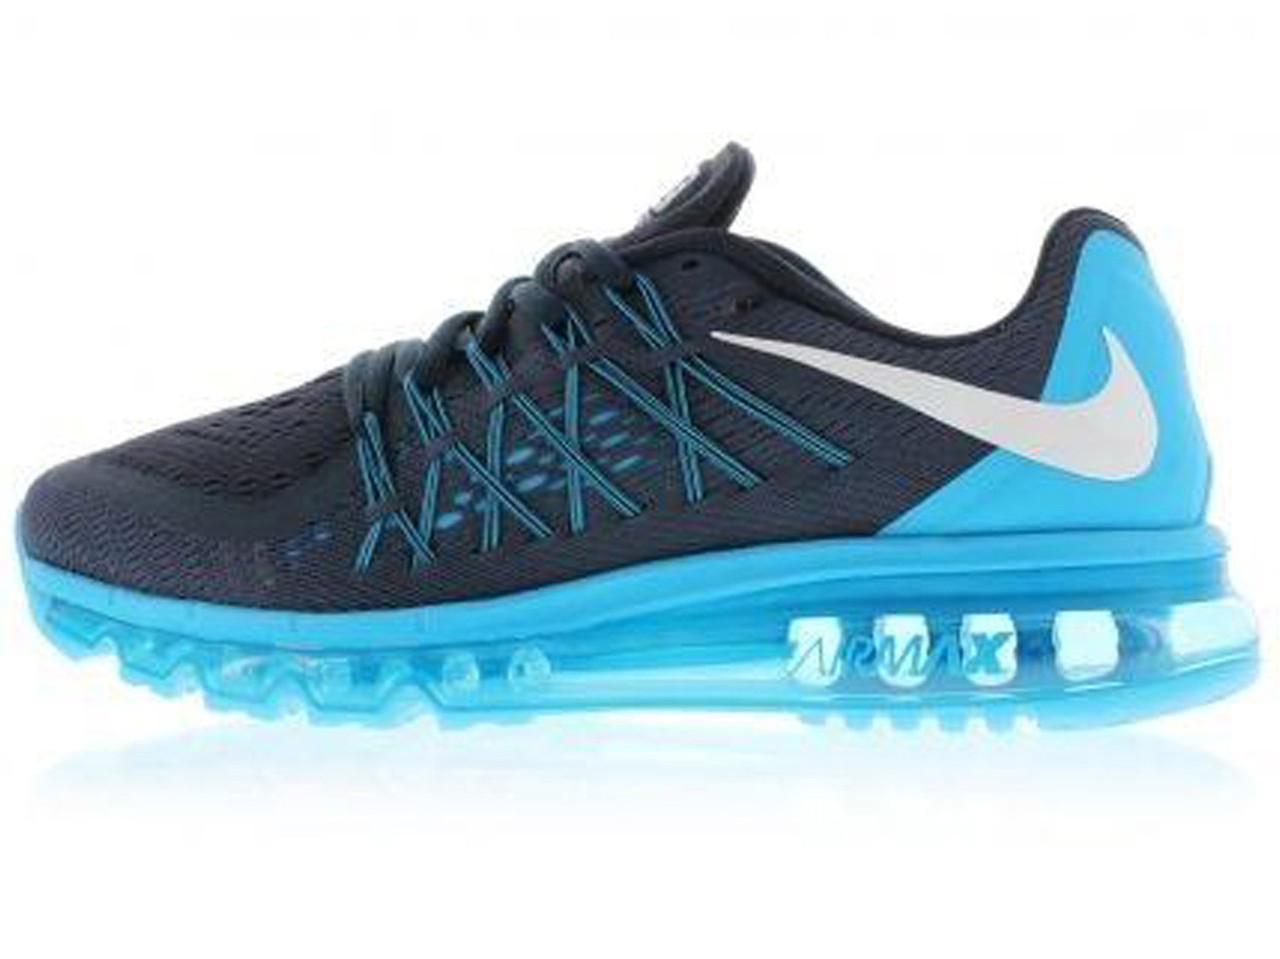 e996eb21ddc6 Мужские Кроссовки Nike Air Max 2015 Blue Black (Реплика ААА+) — в ...